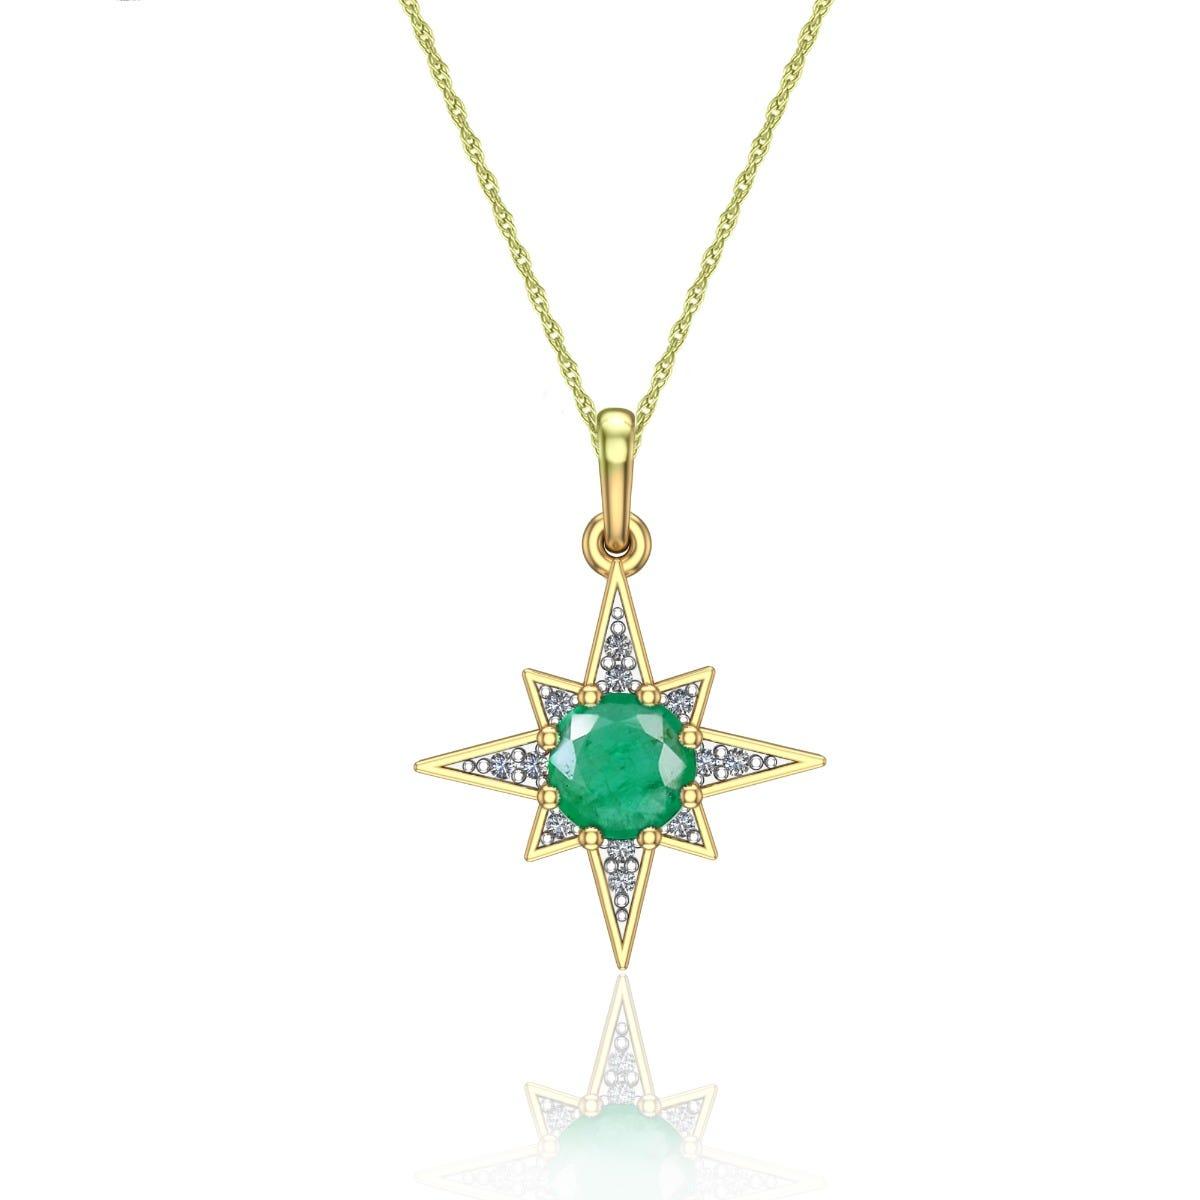 Round-Cut Emerald & Diamond Pendant in 10k Yellow Gold